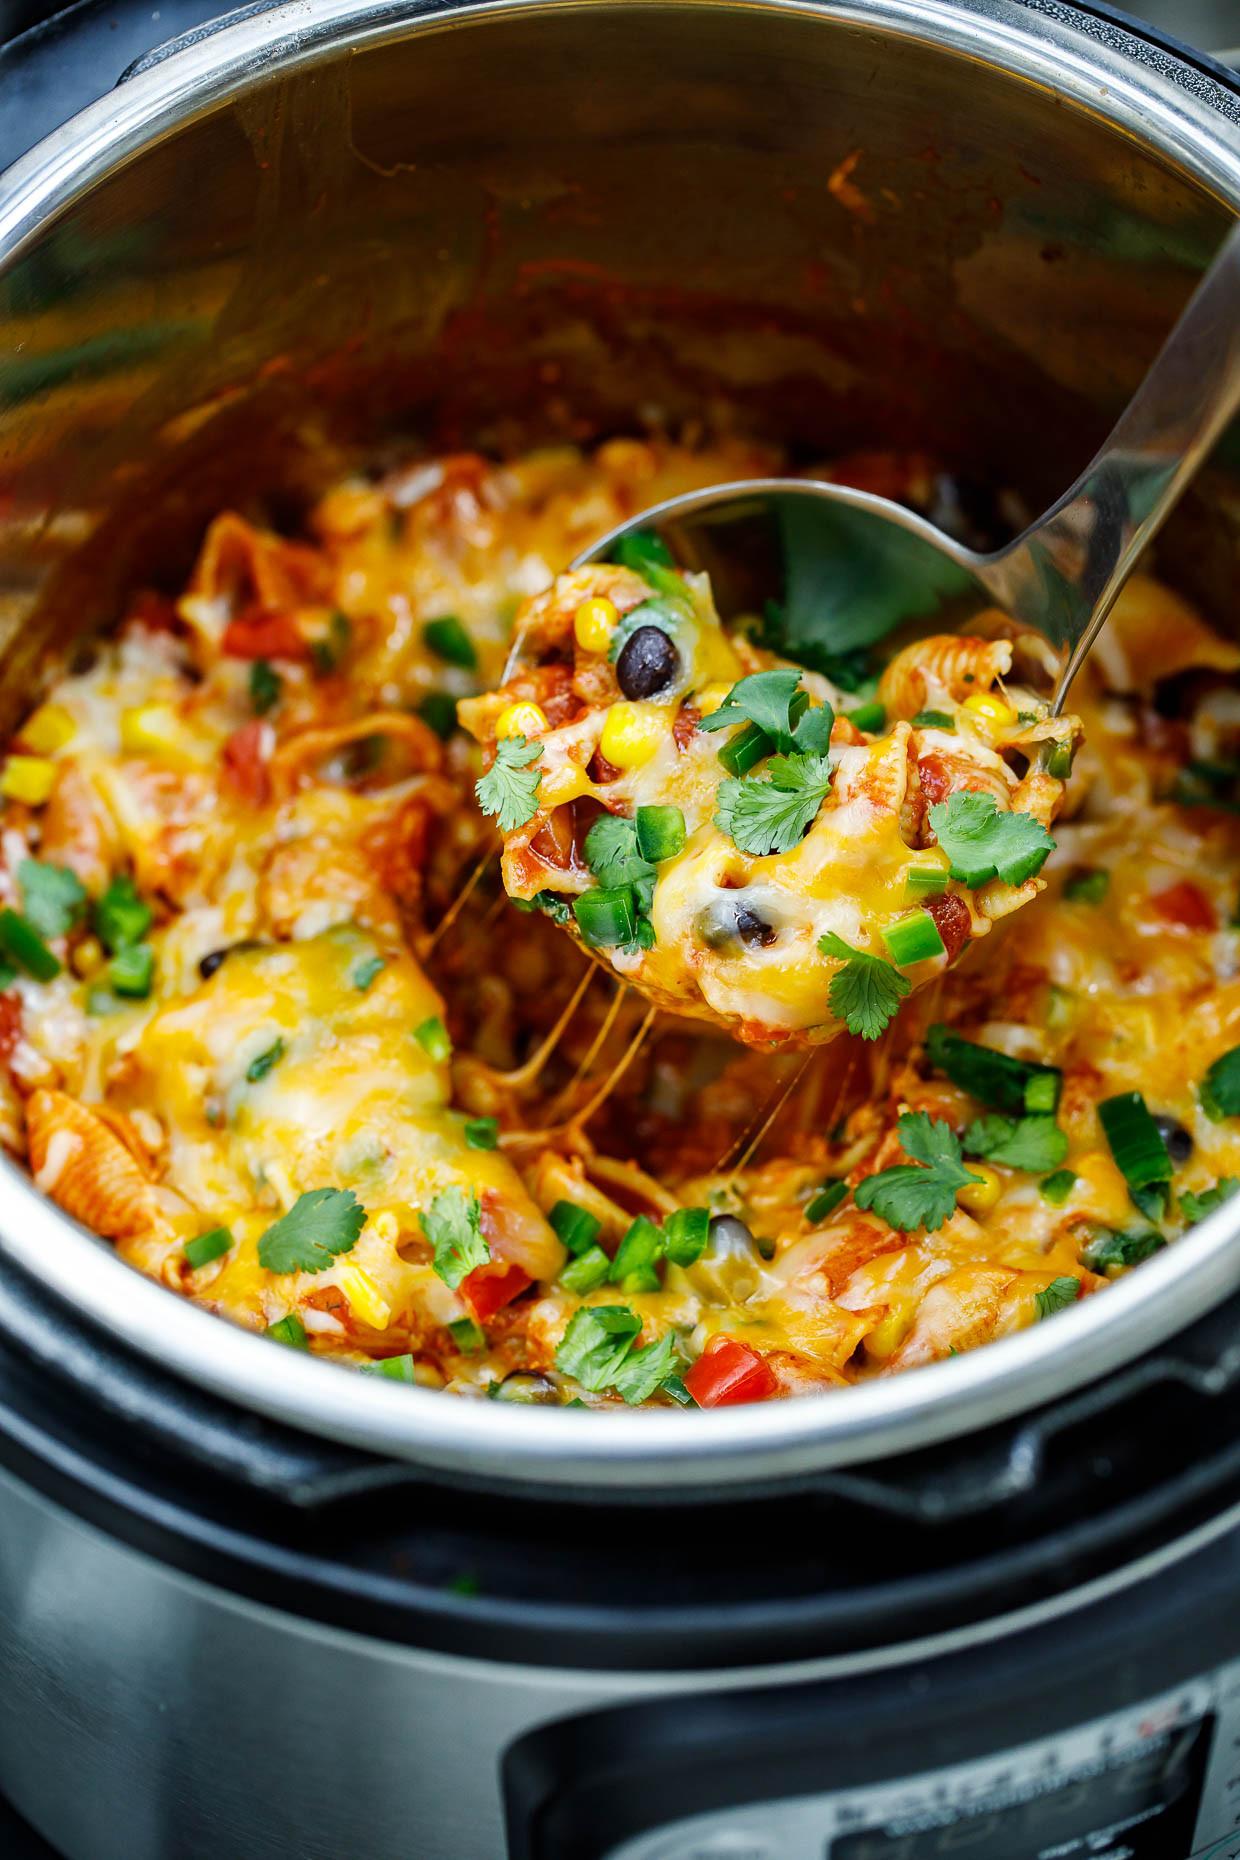 Easy Instant Pot Recipes Vegetarian  Ve arian Instant Pot Taco Pasta Recipe Peas and Crayons